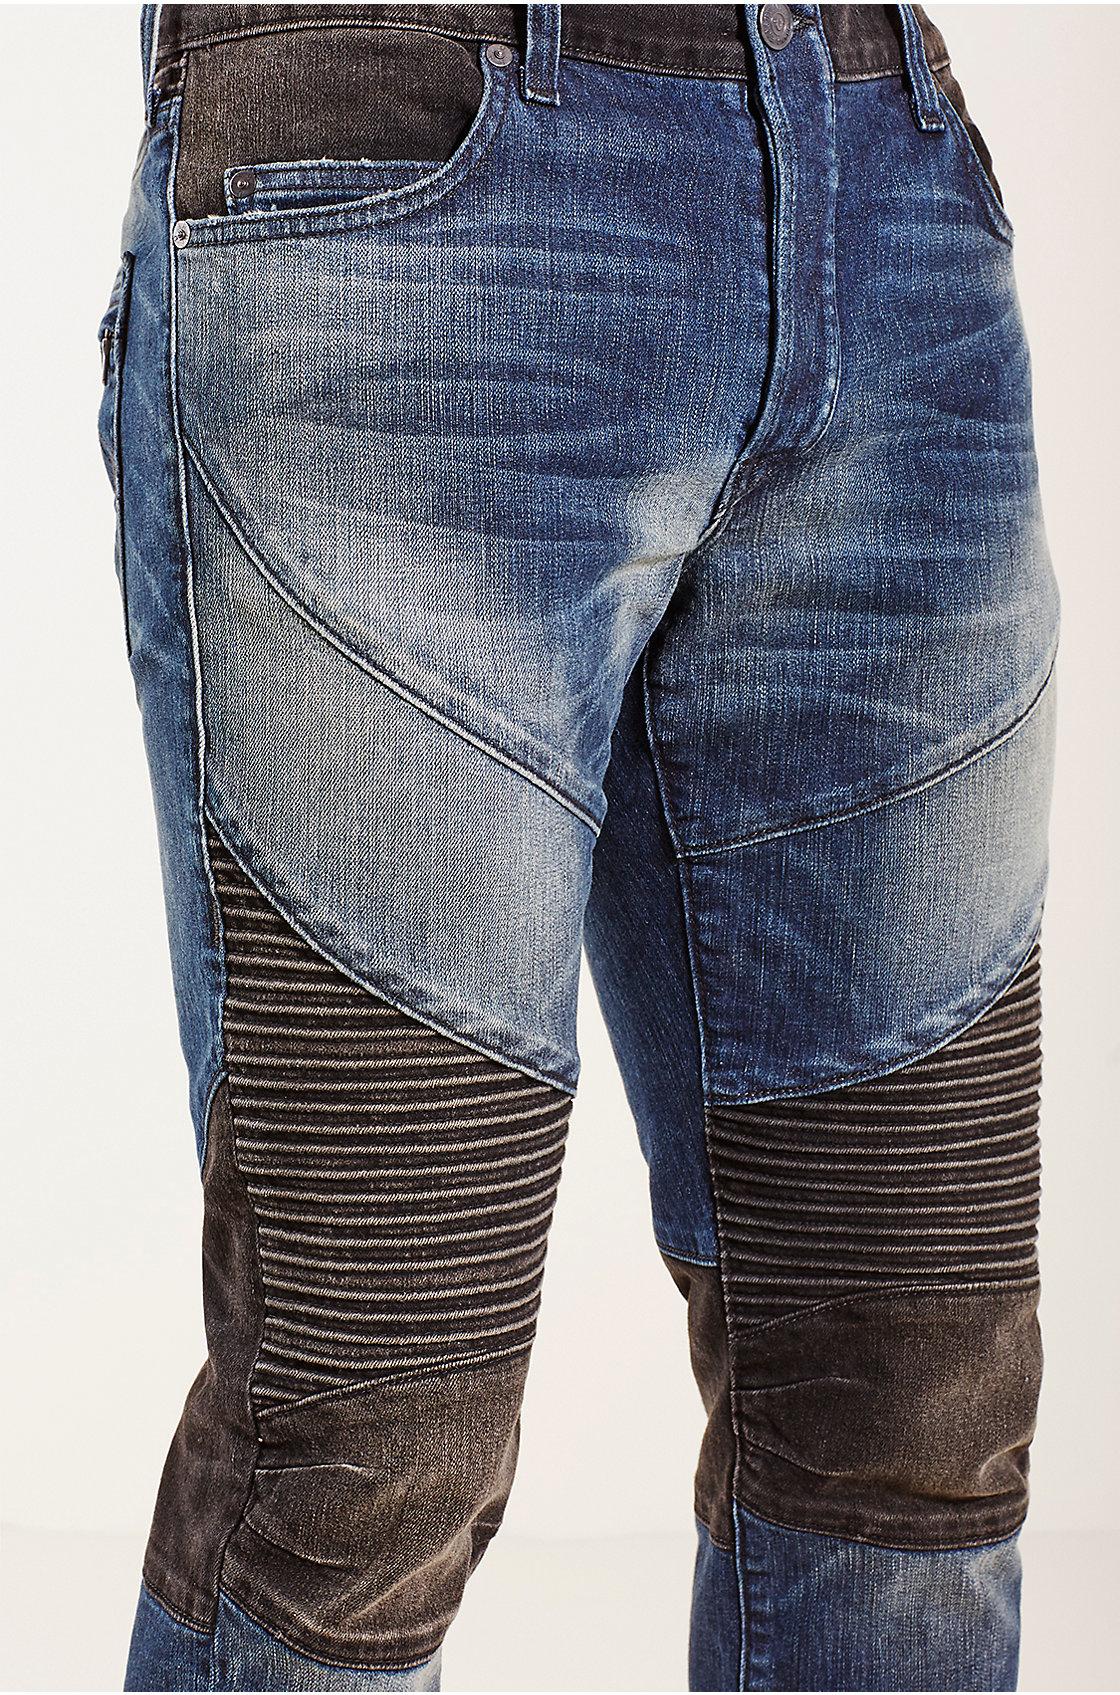 Mens Blue Jean Jackets